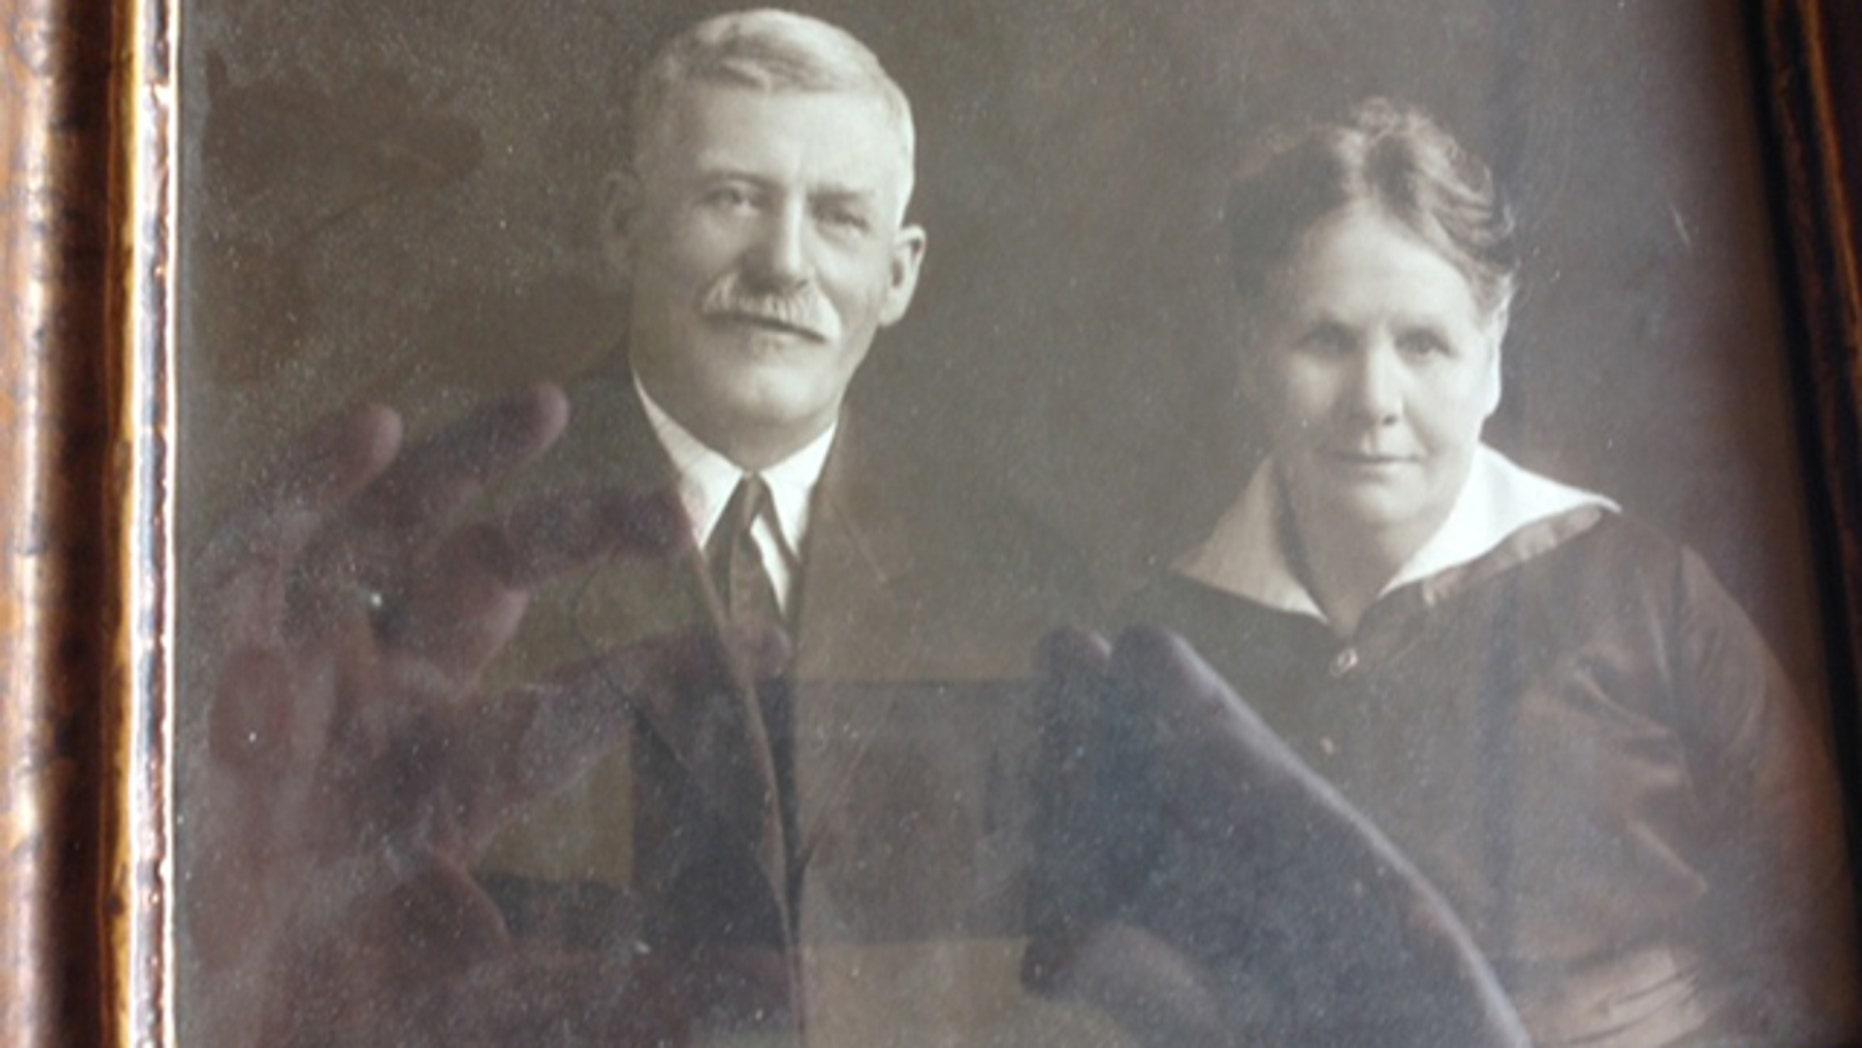 Investigators seek DNA to close 1926 Oregon missing person case